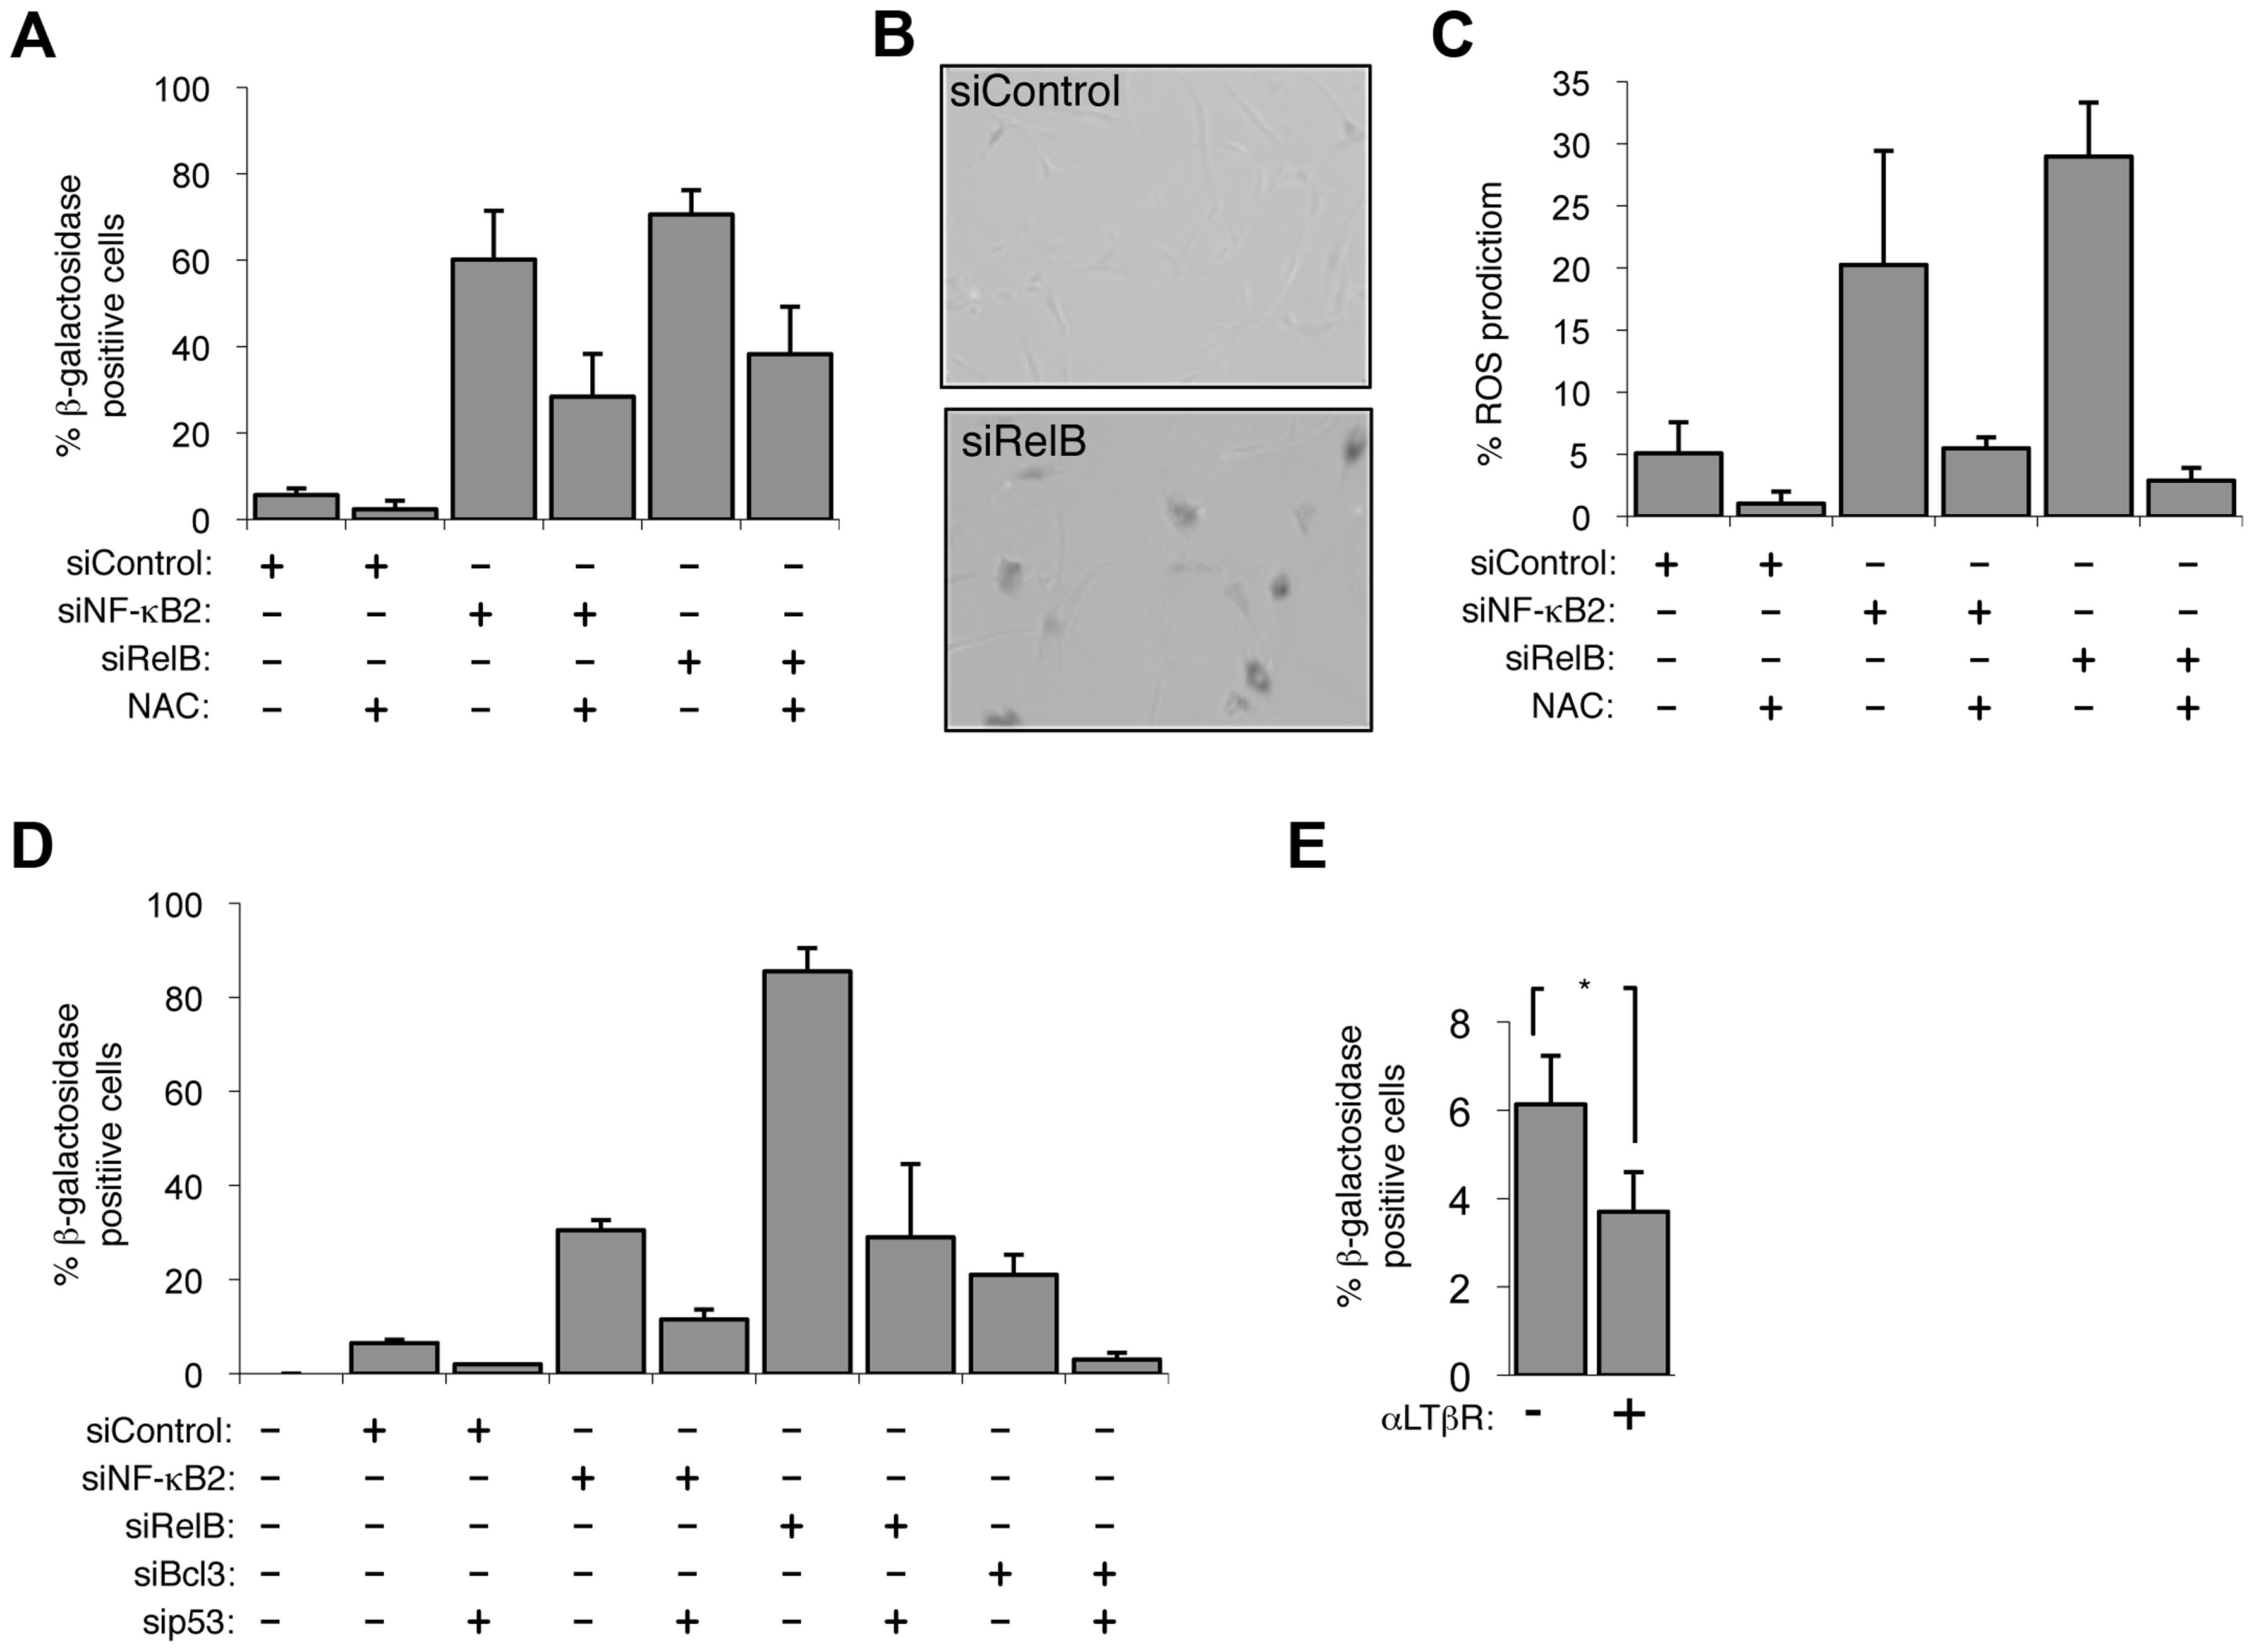 The alternative NF-κB pathway suppresses p53 mediated senescence in primary fibroblasts.